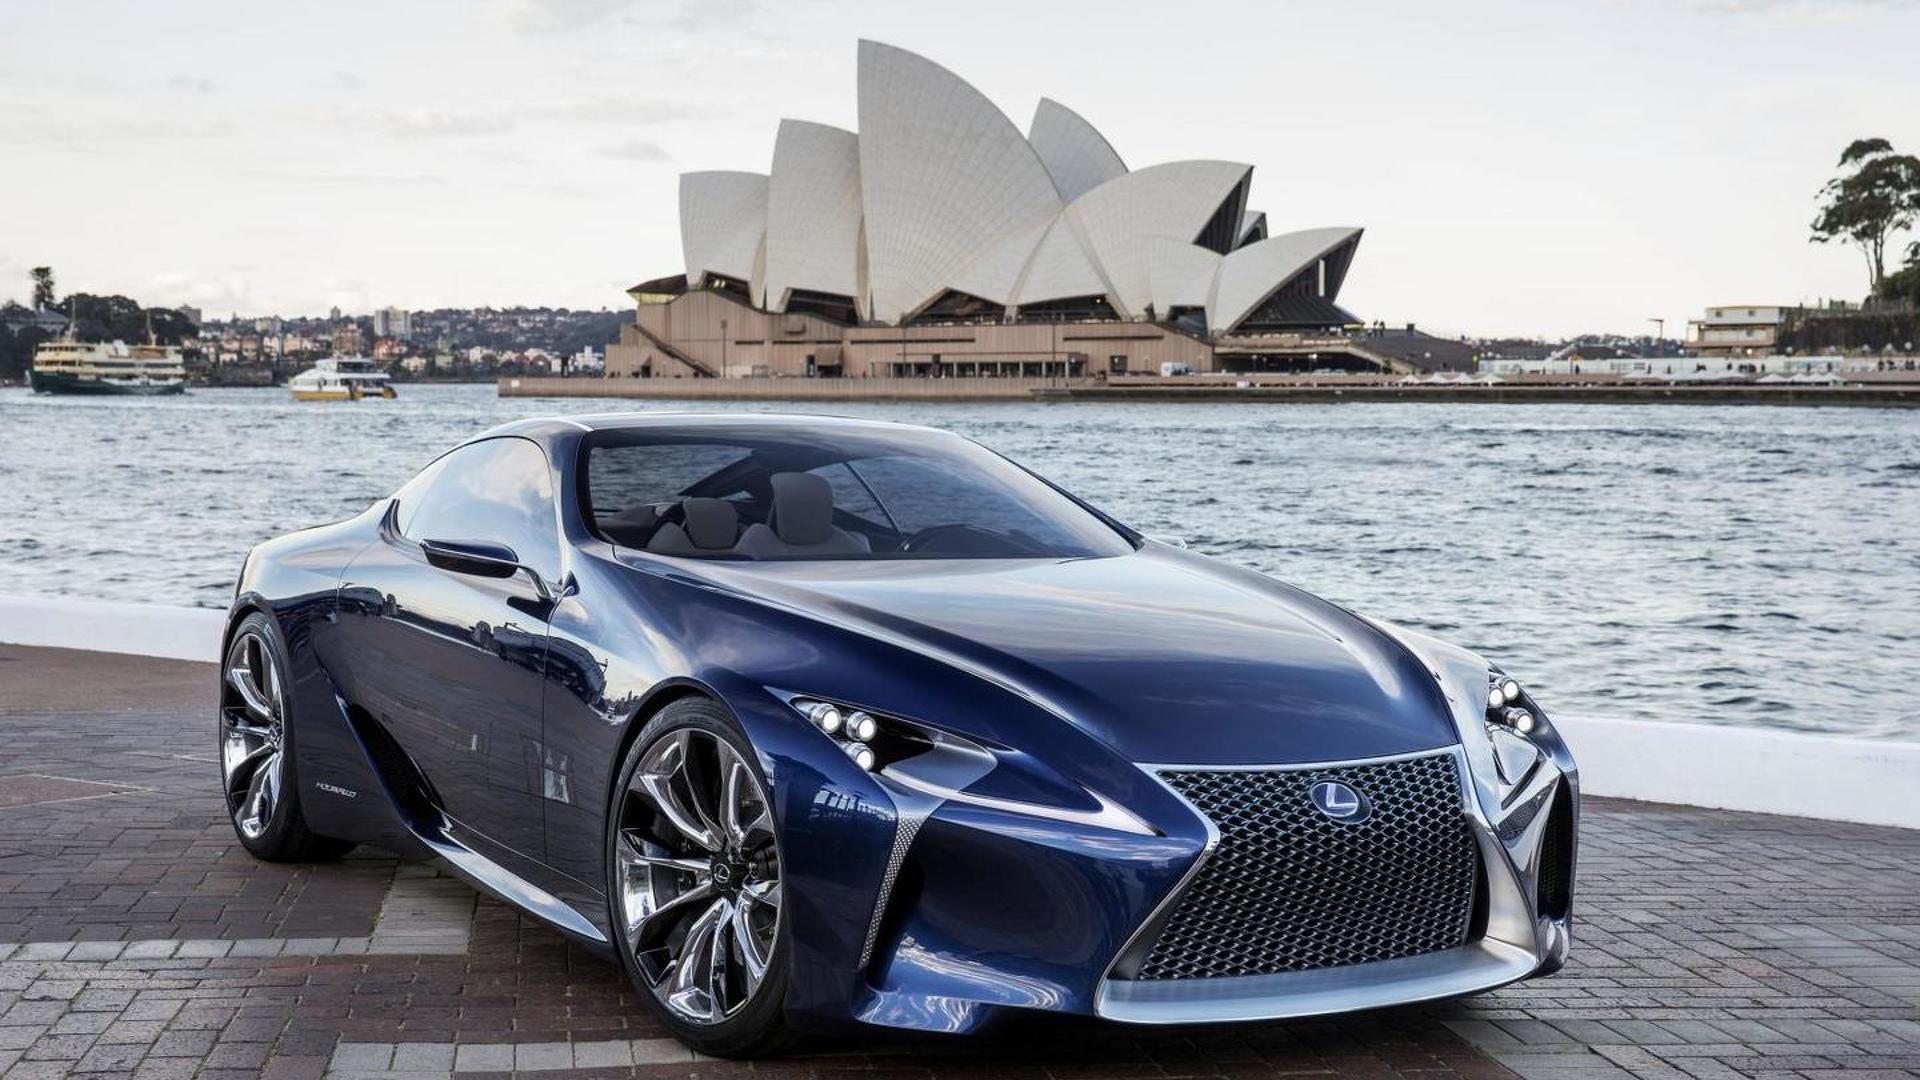 Lexus Lfa Successor Based On Lf Lc Concept Planned